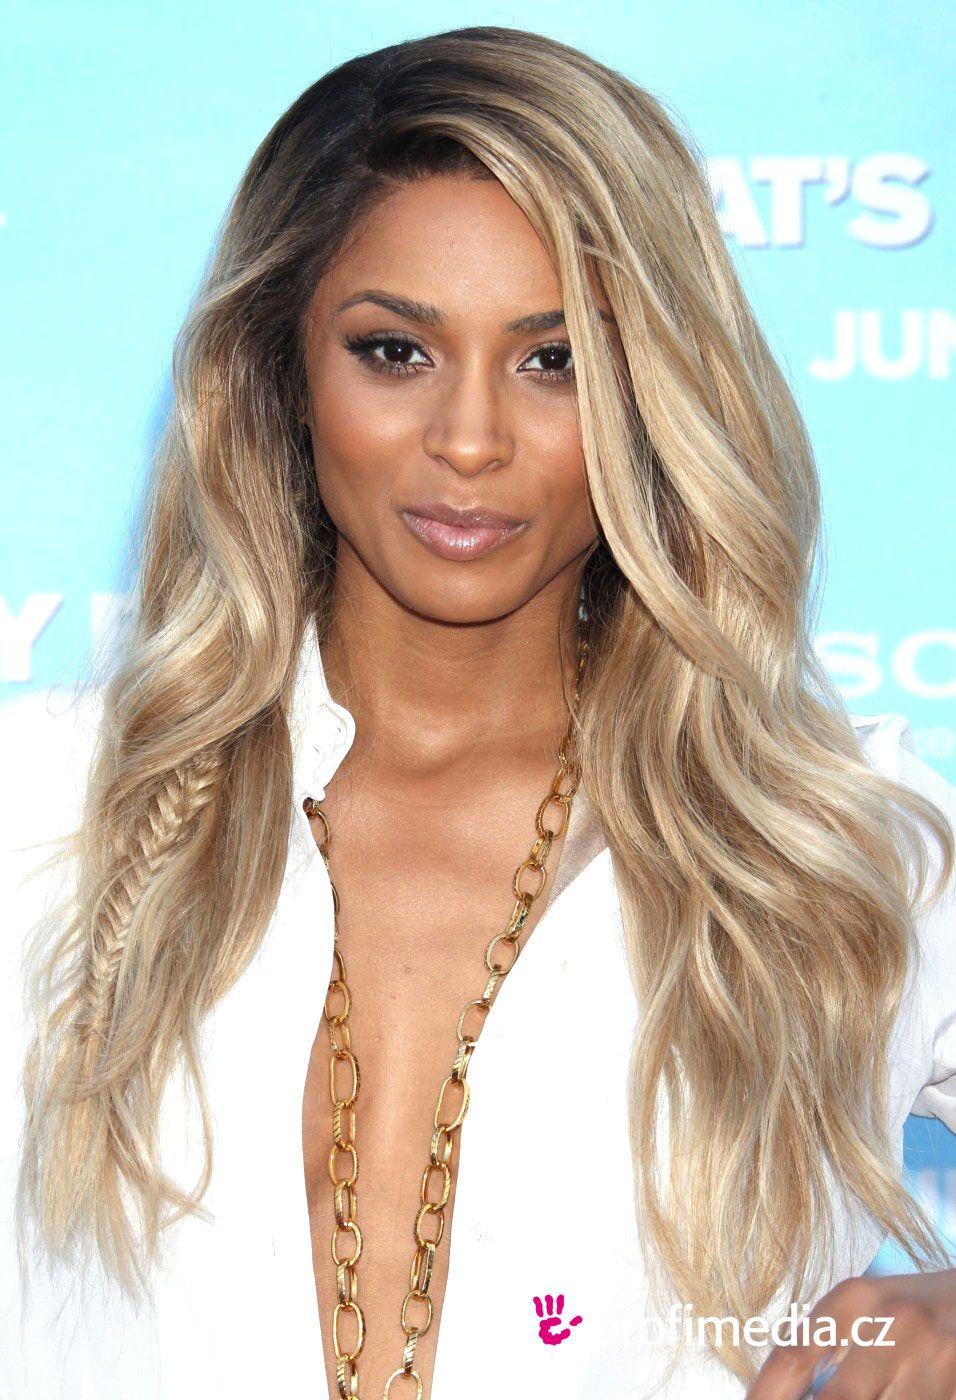 Short Dark Blonde Hair Cool Hairstyles In 2019 Blonde